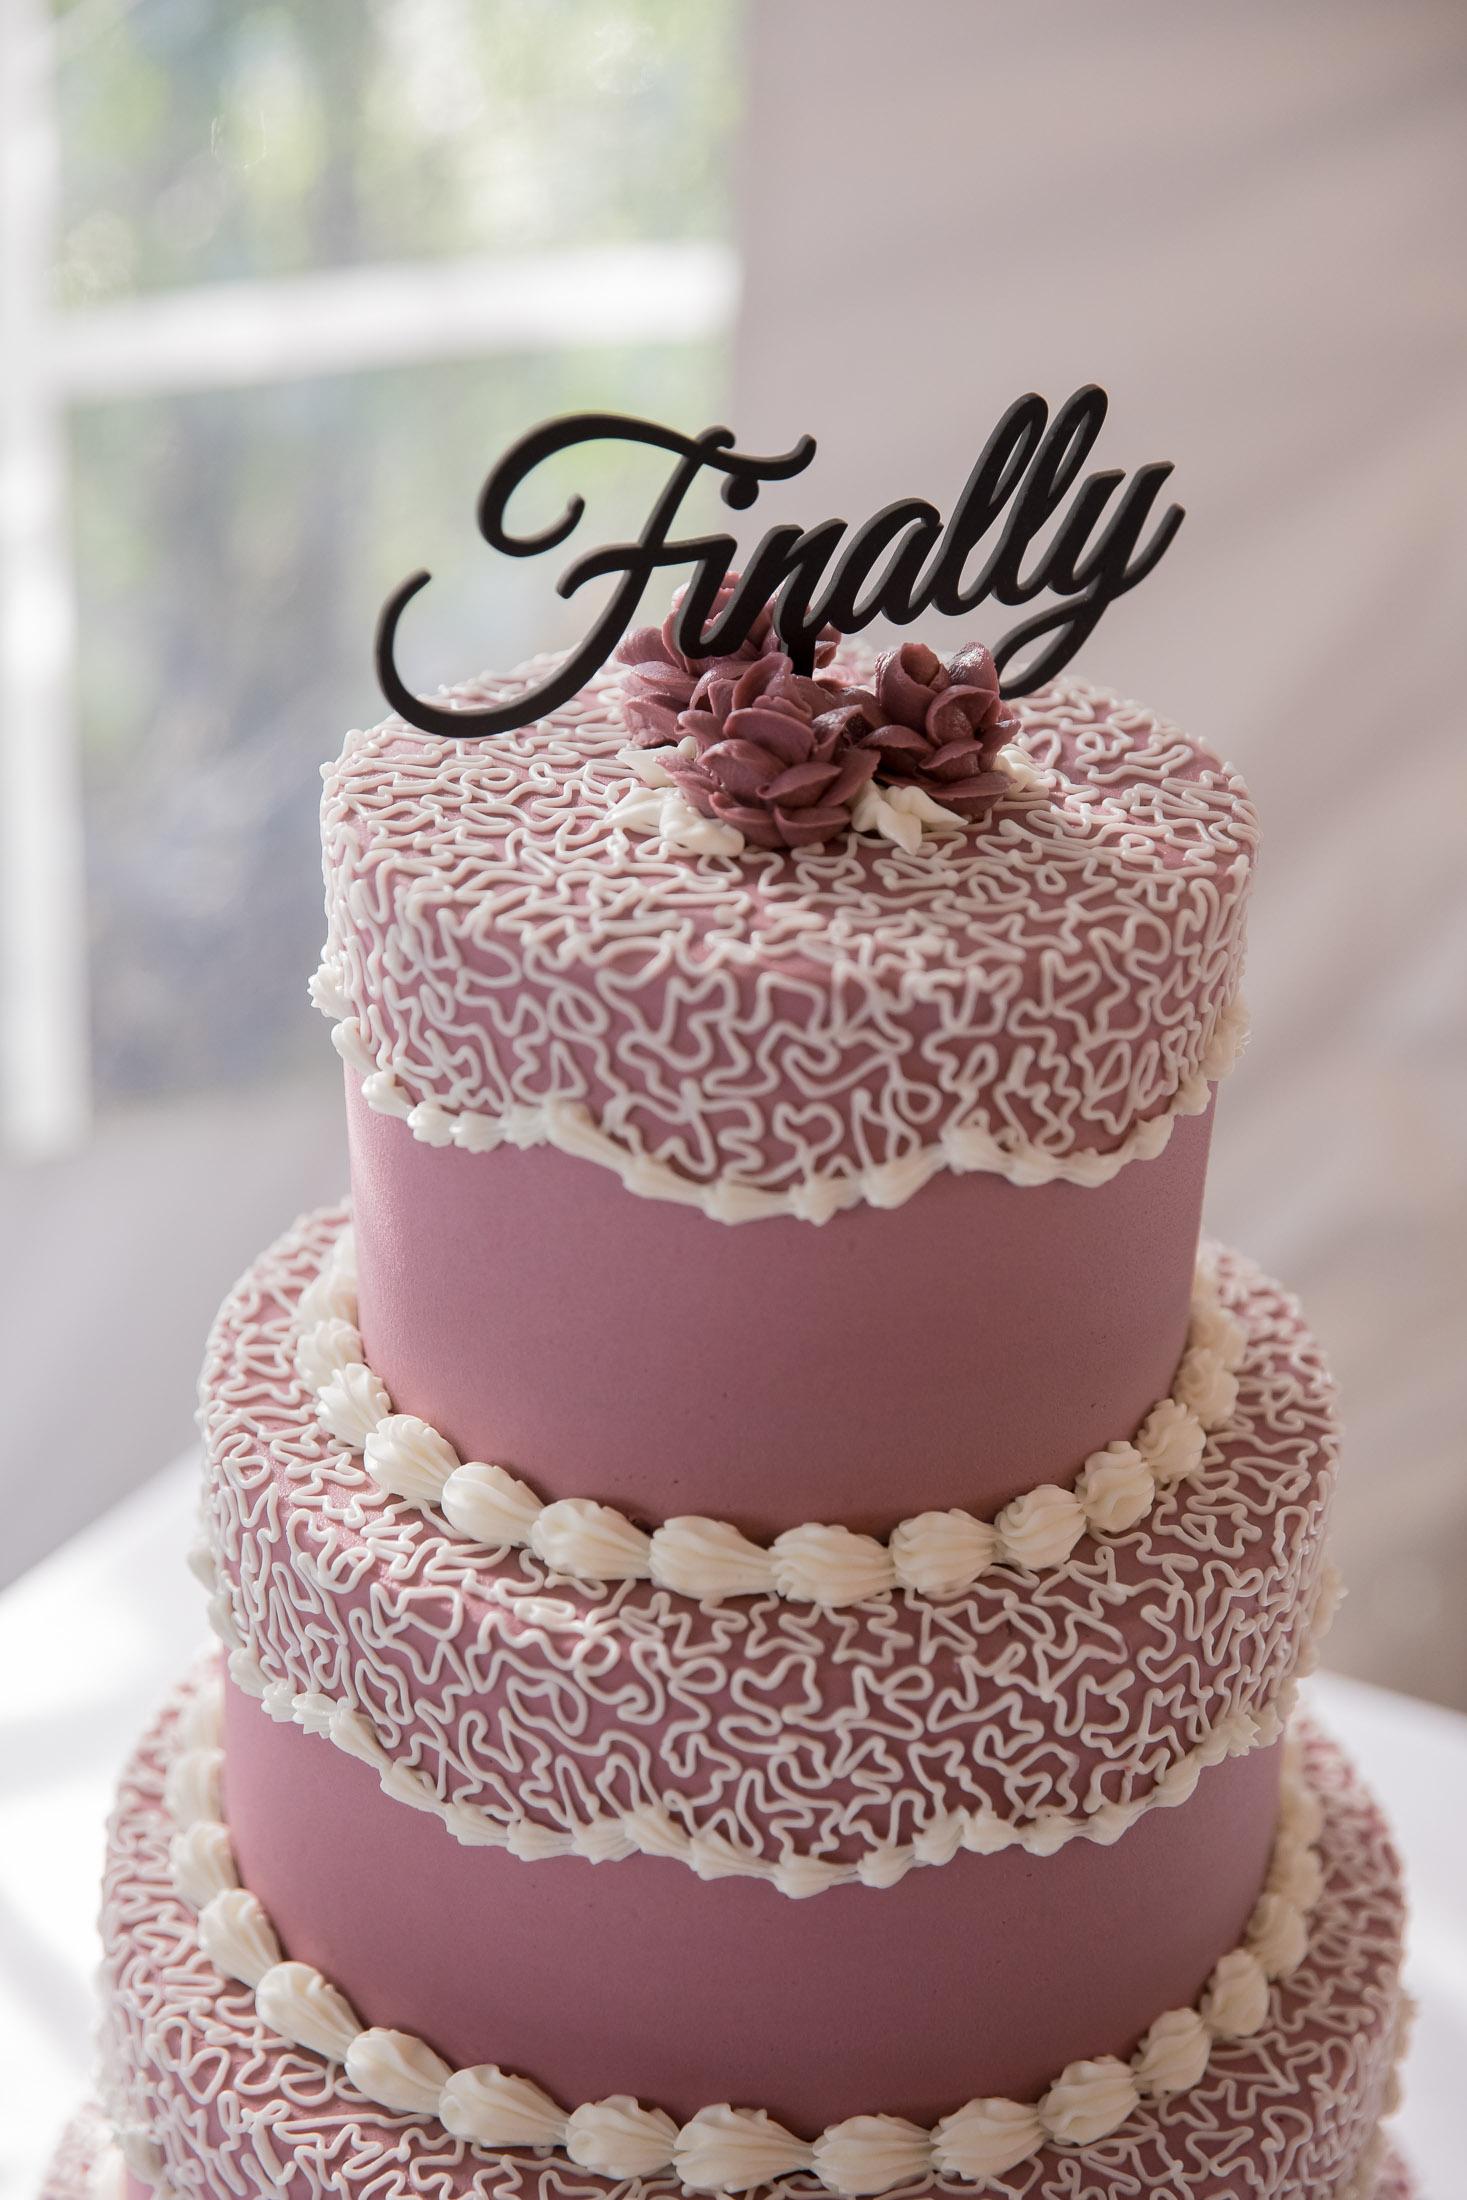 Cake, details, wedding, tracy jenkins photography, publick house, Massachusetts, new england,  photography